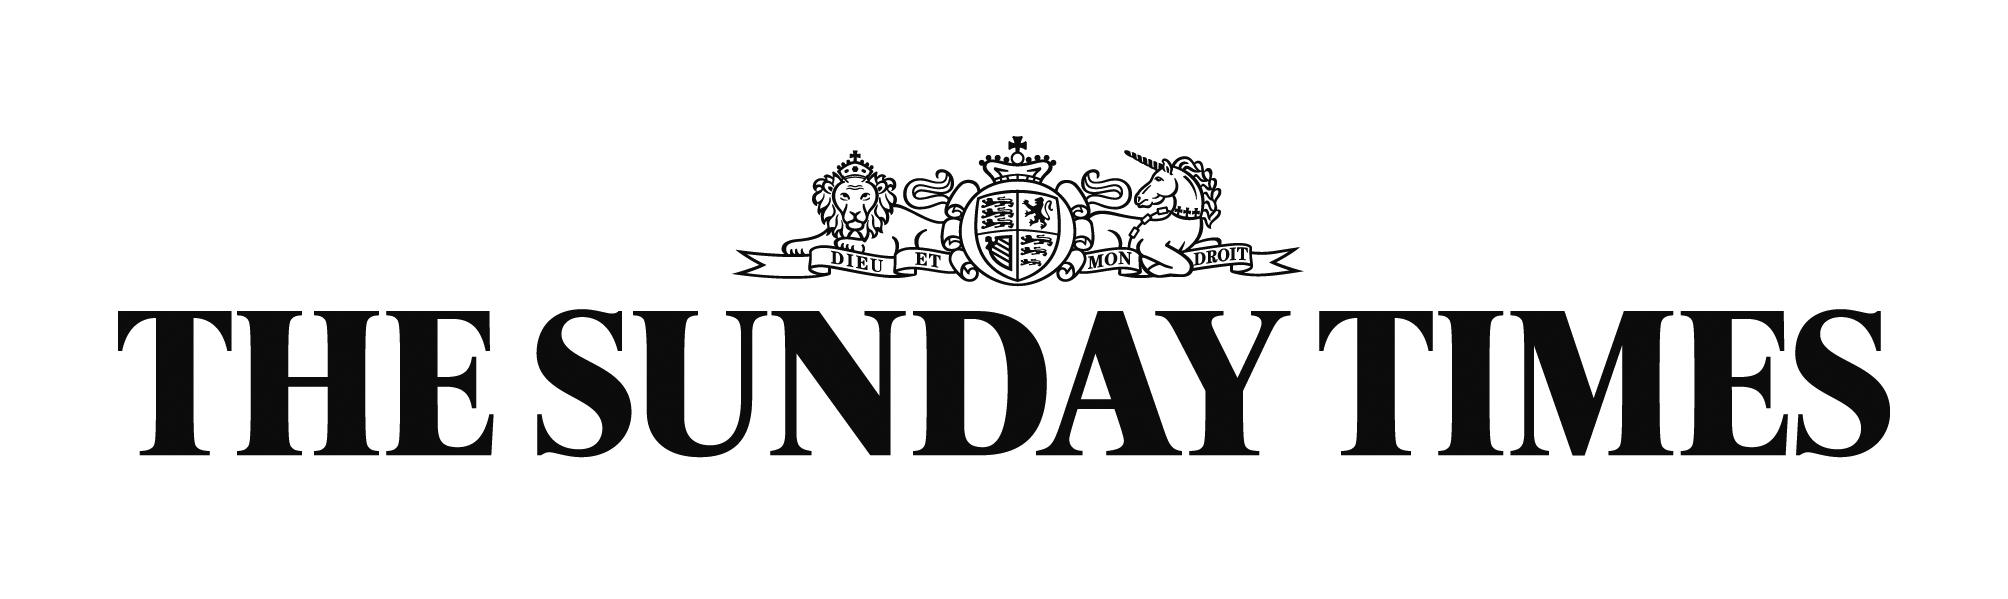 The-Sunday-Times.jpg